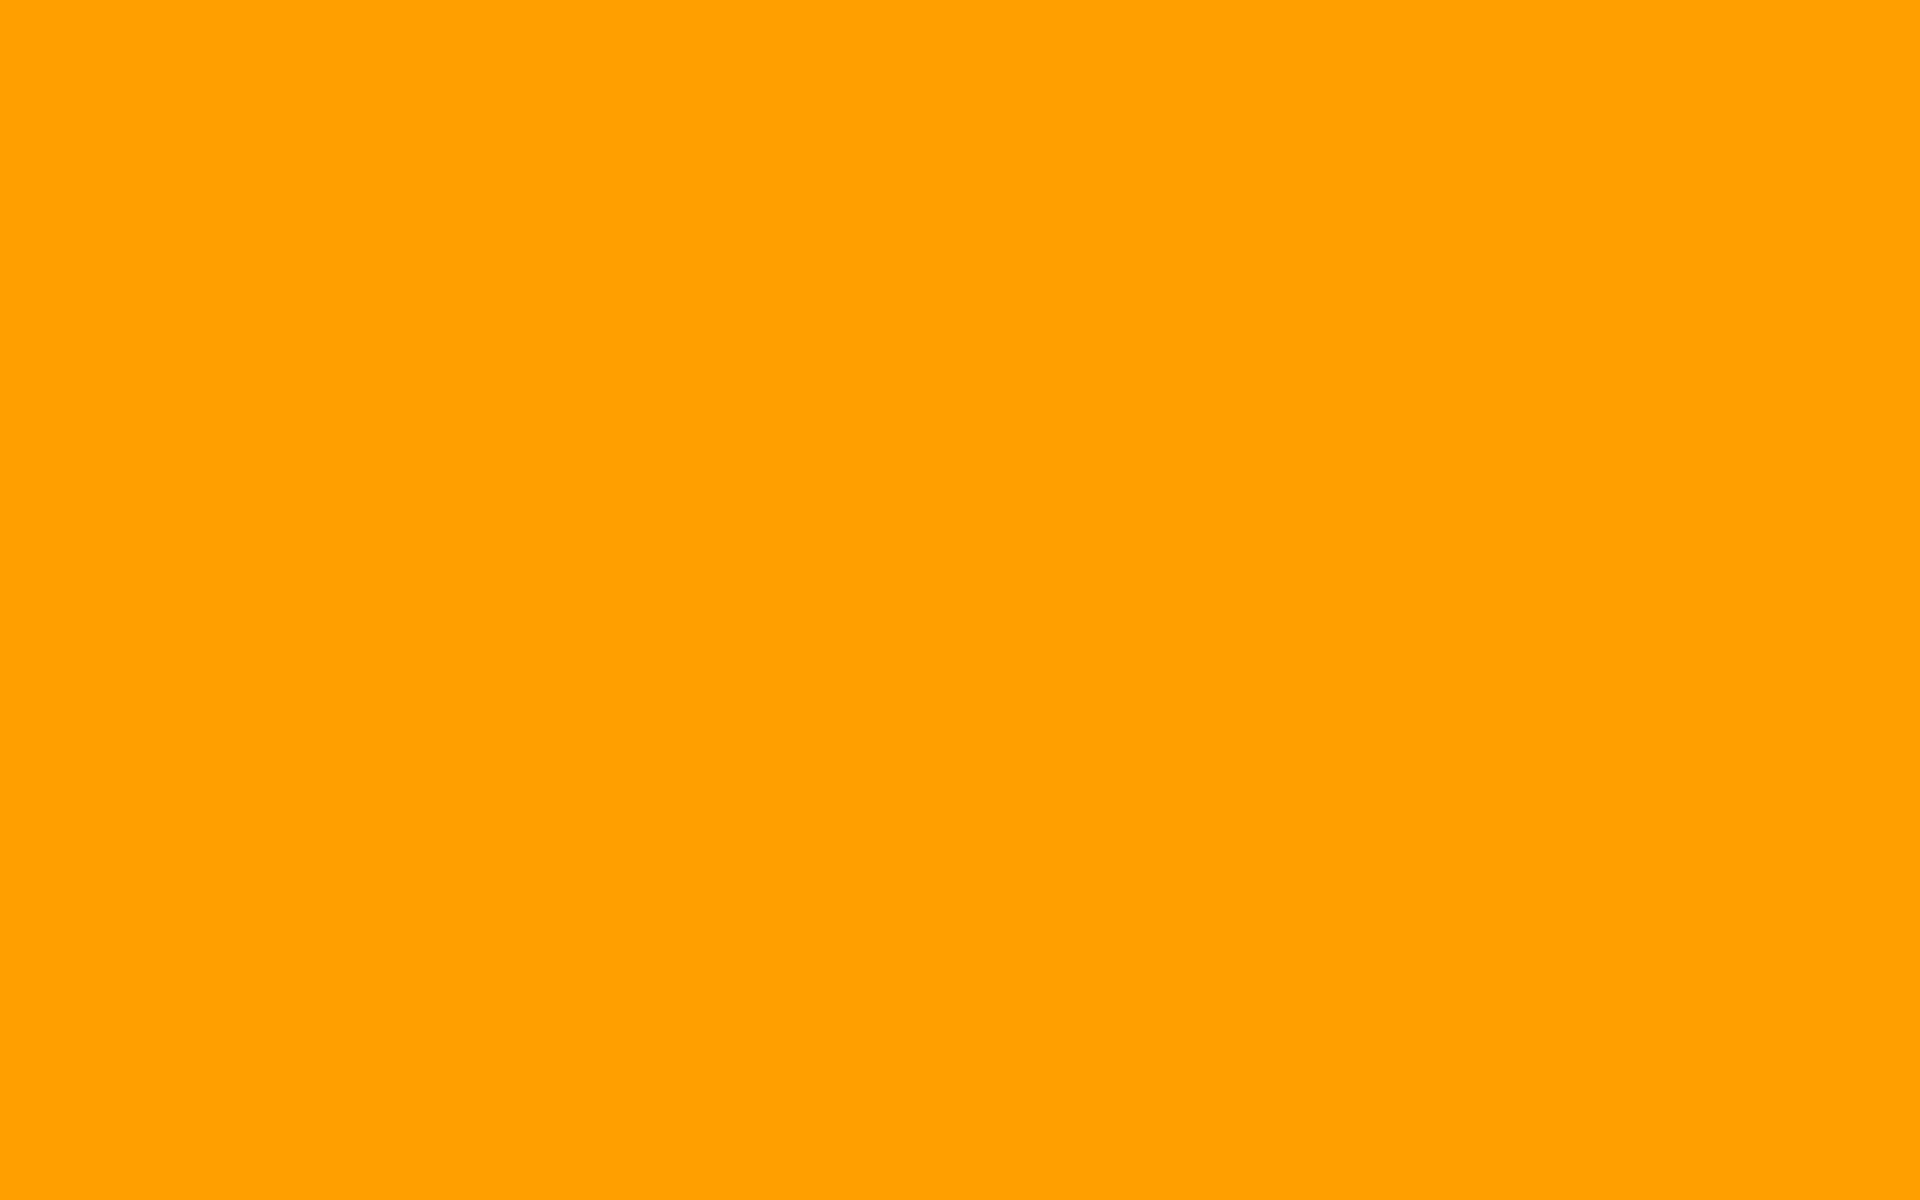 1920x1200 Orange Peel Solid Color Background